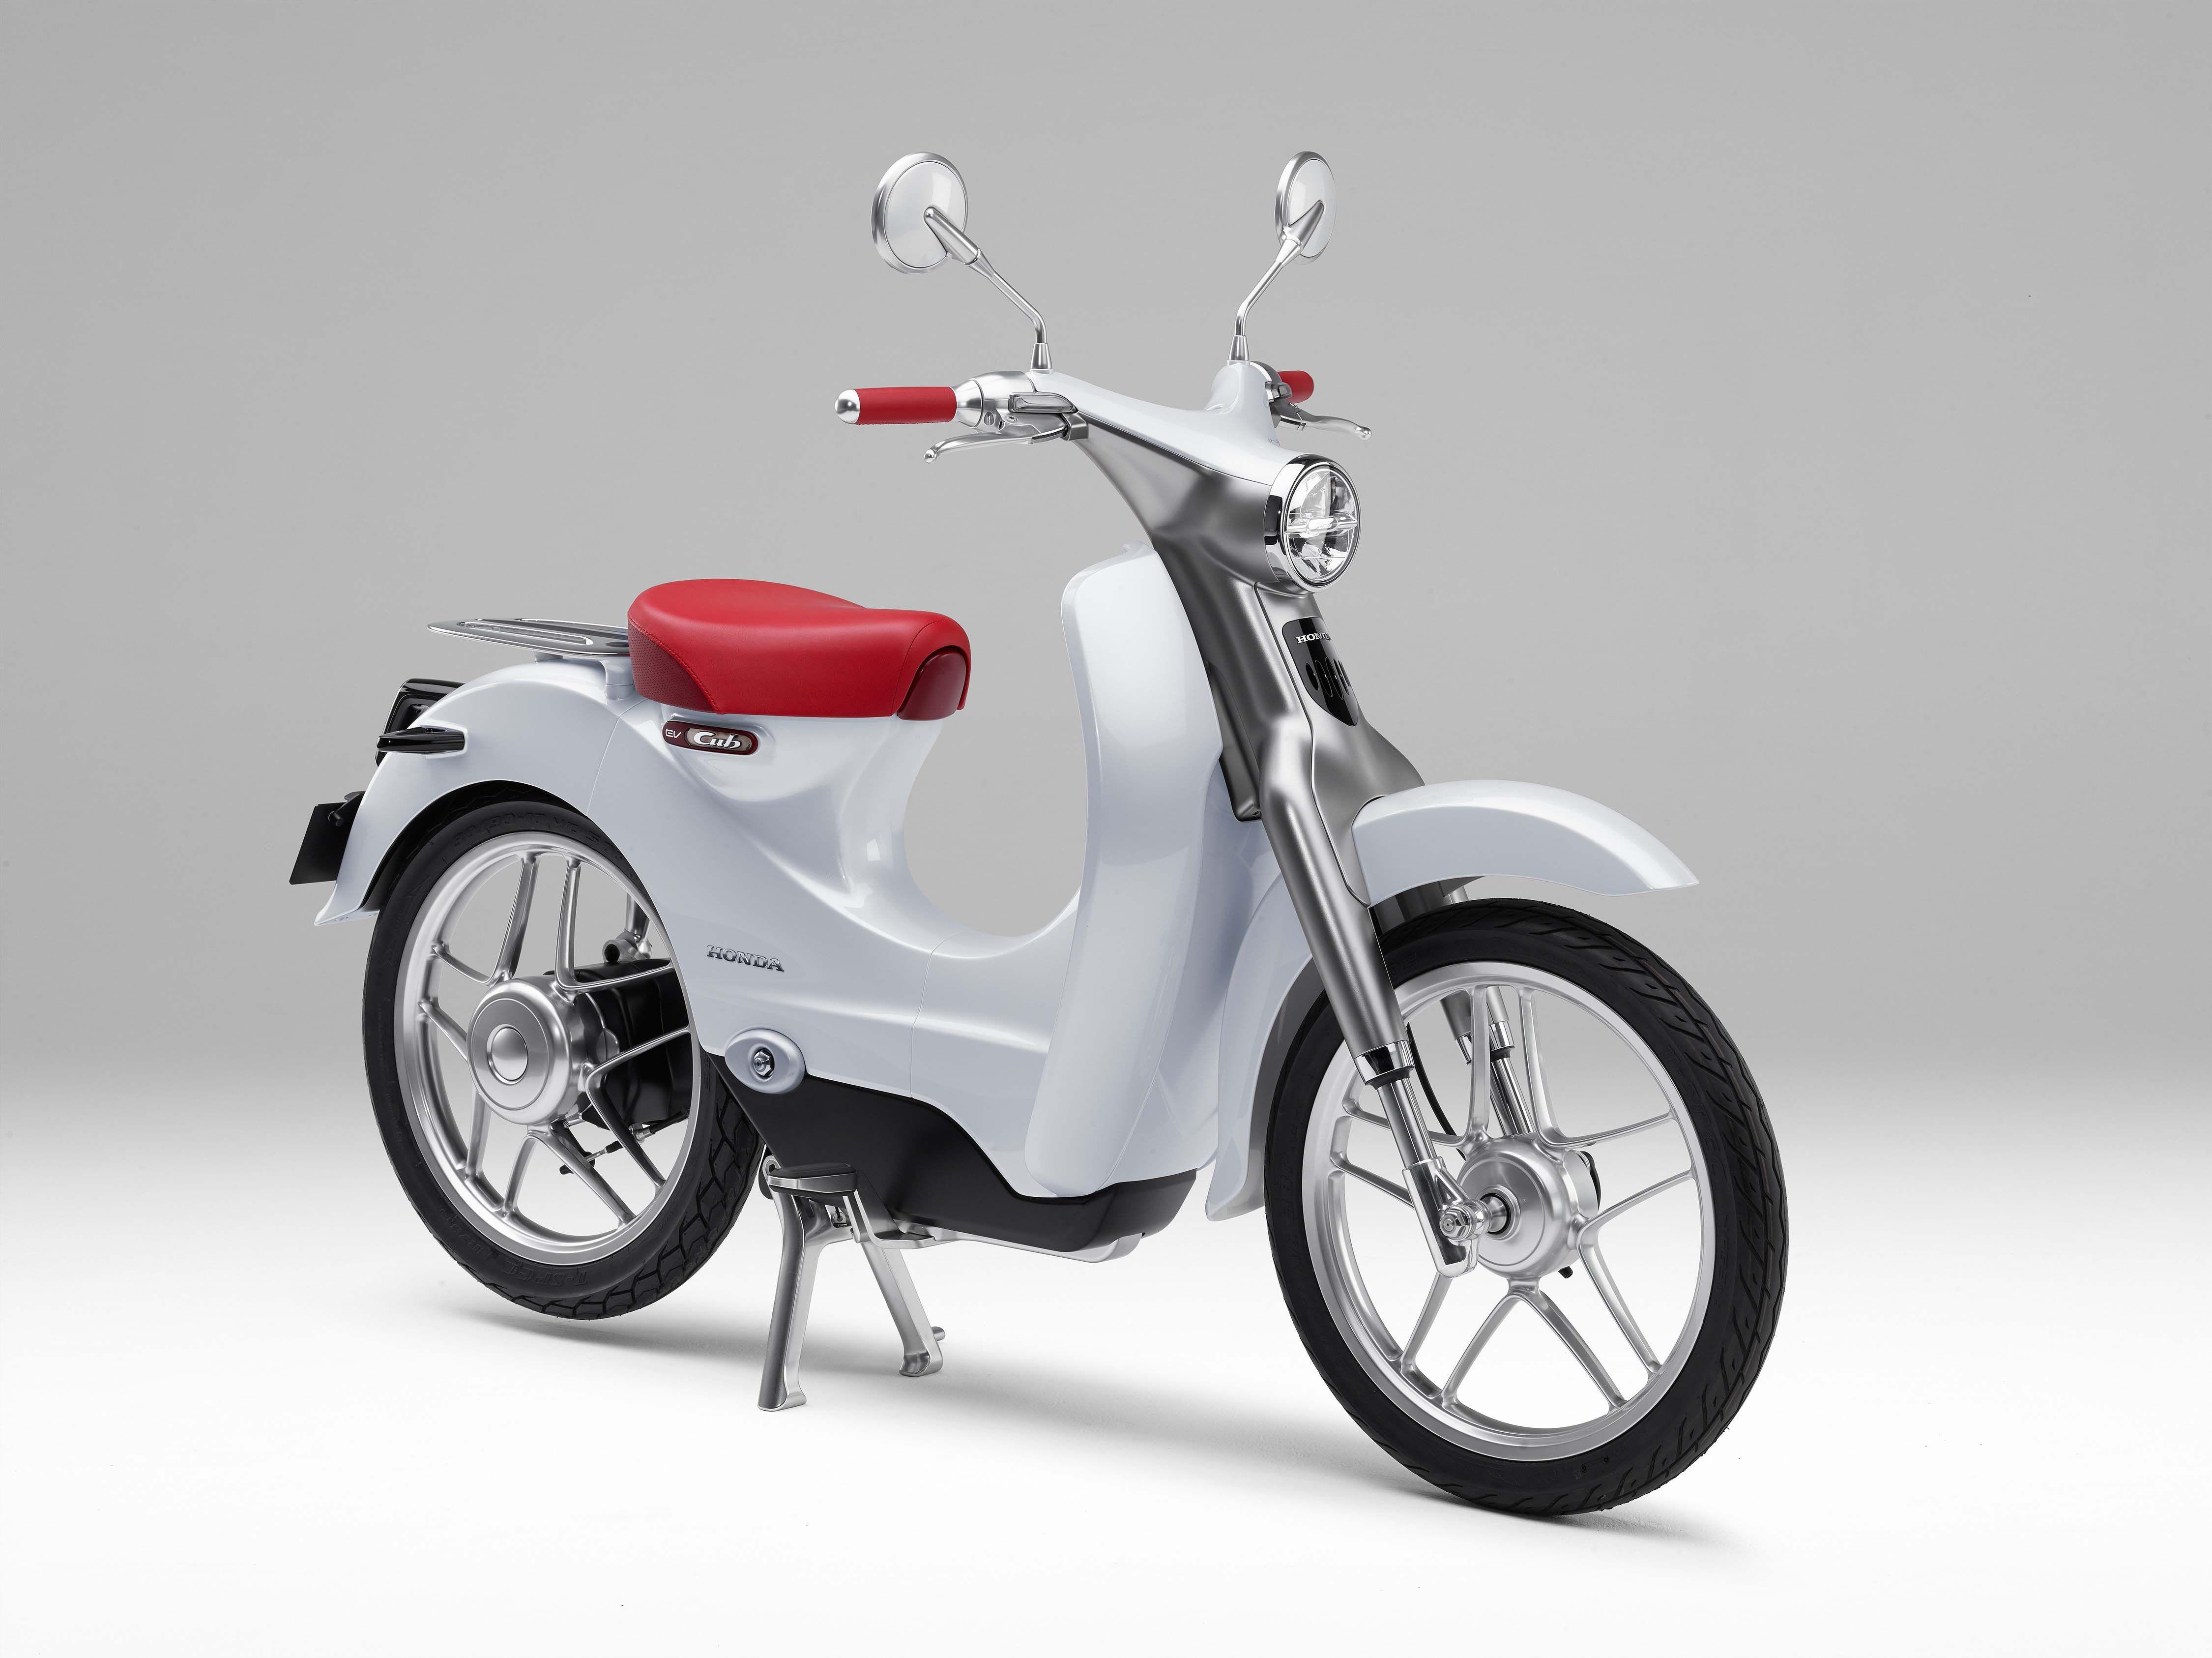 HONDA # EV Cub Concept   DREAM MOTOR & BIKE CYLES   Pinterest ...